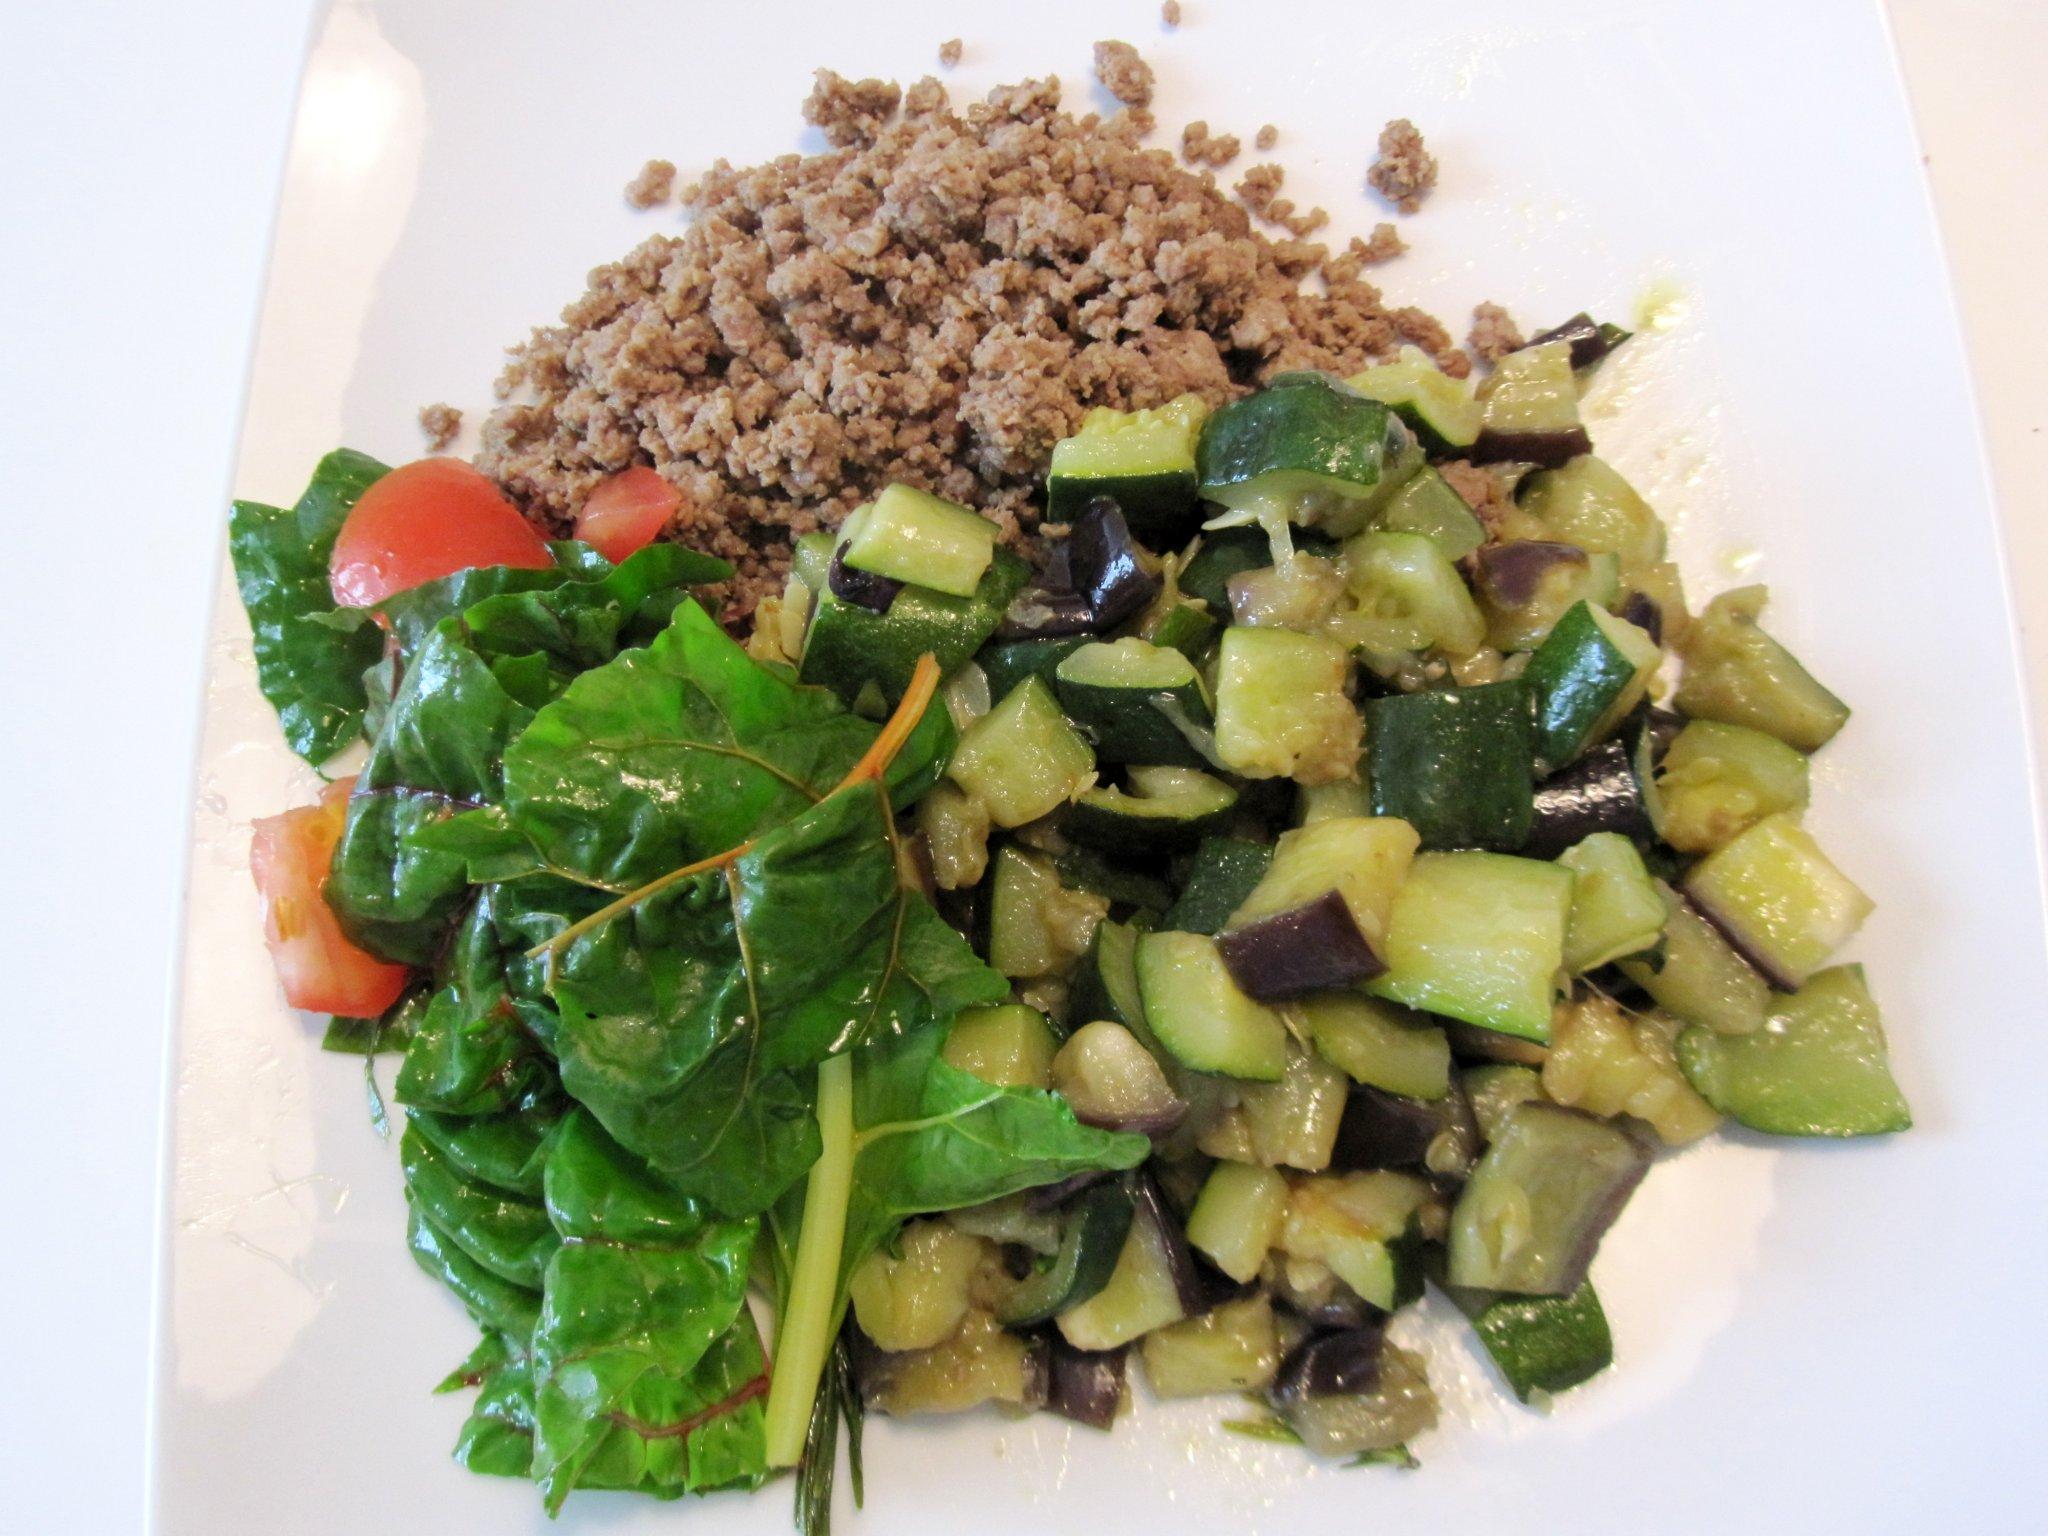 diéta a magas vérnyomásért recept